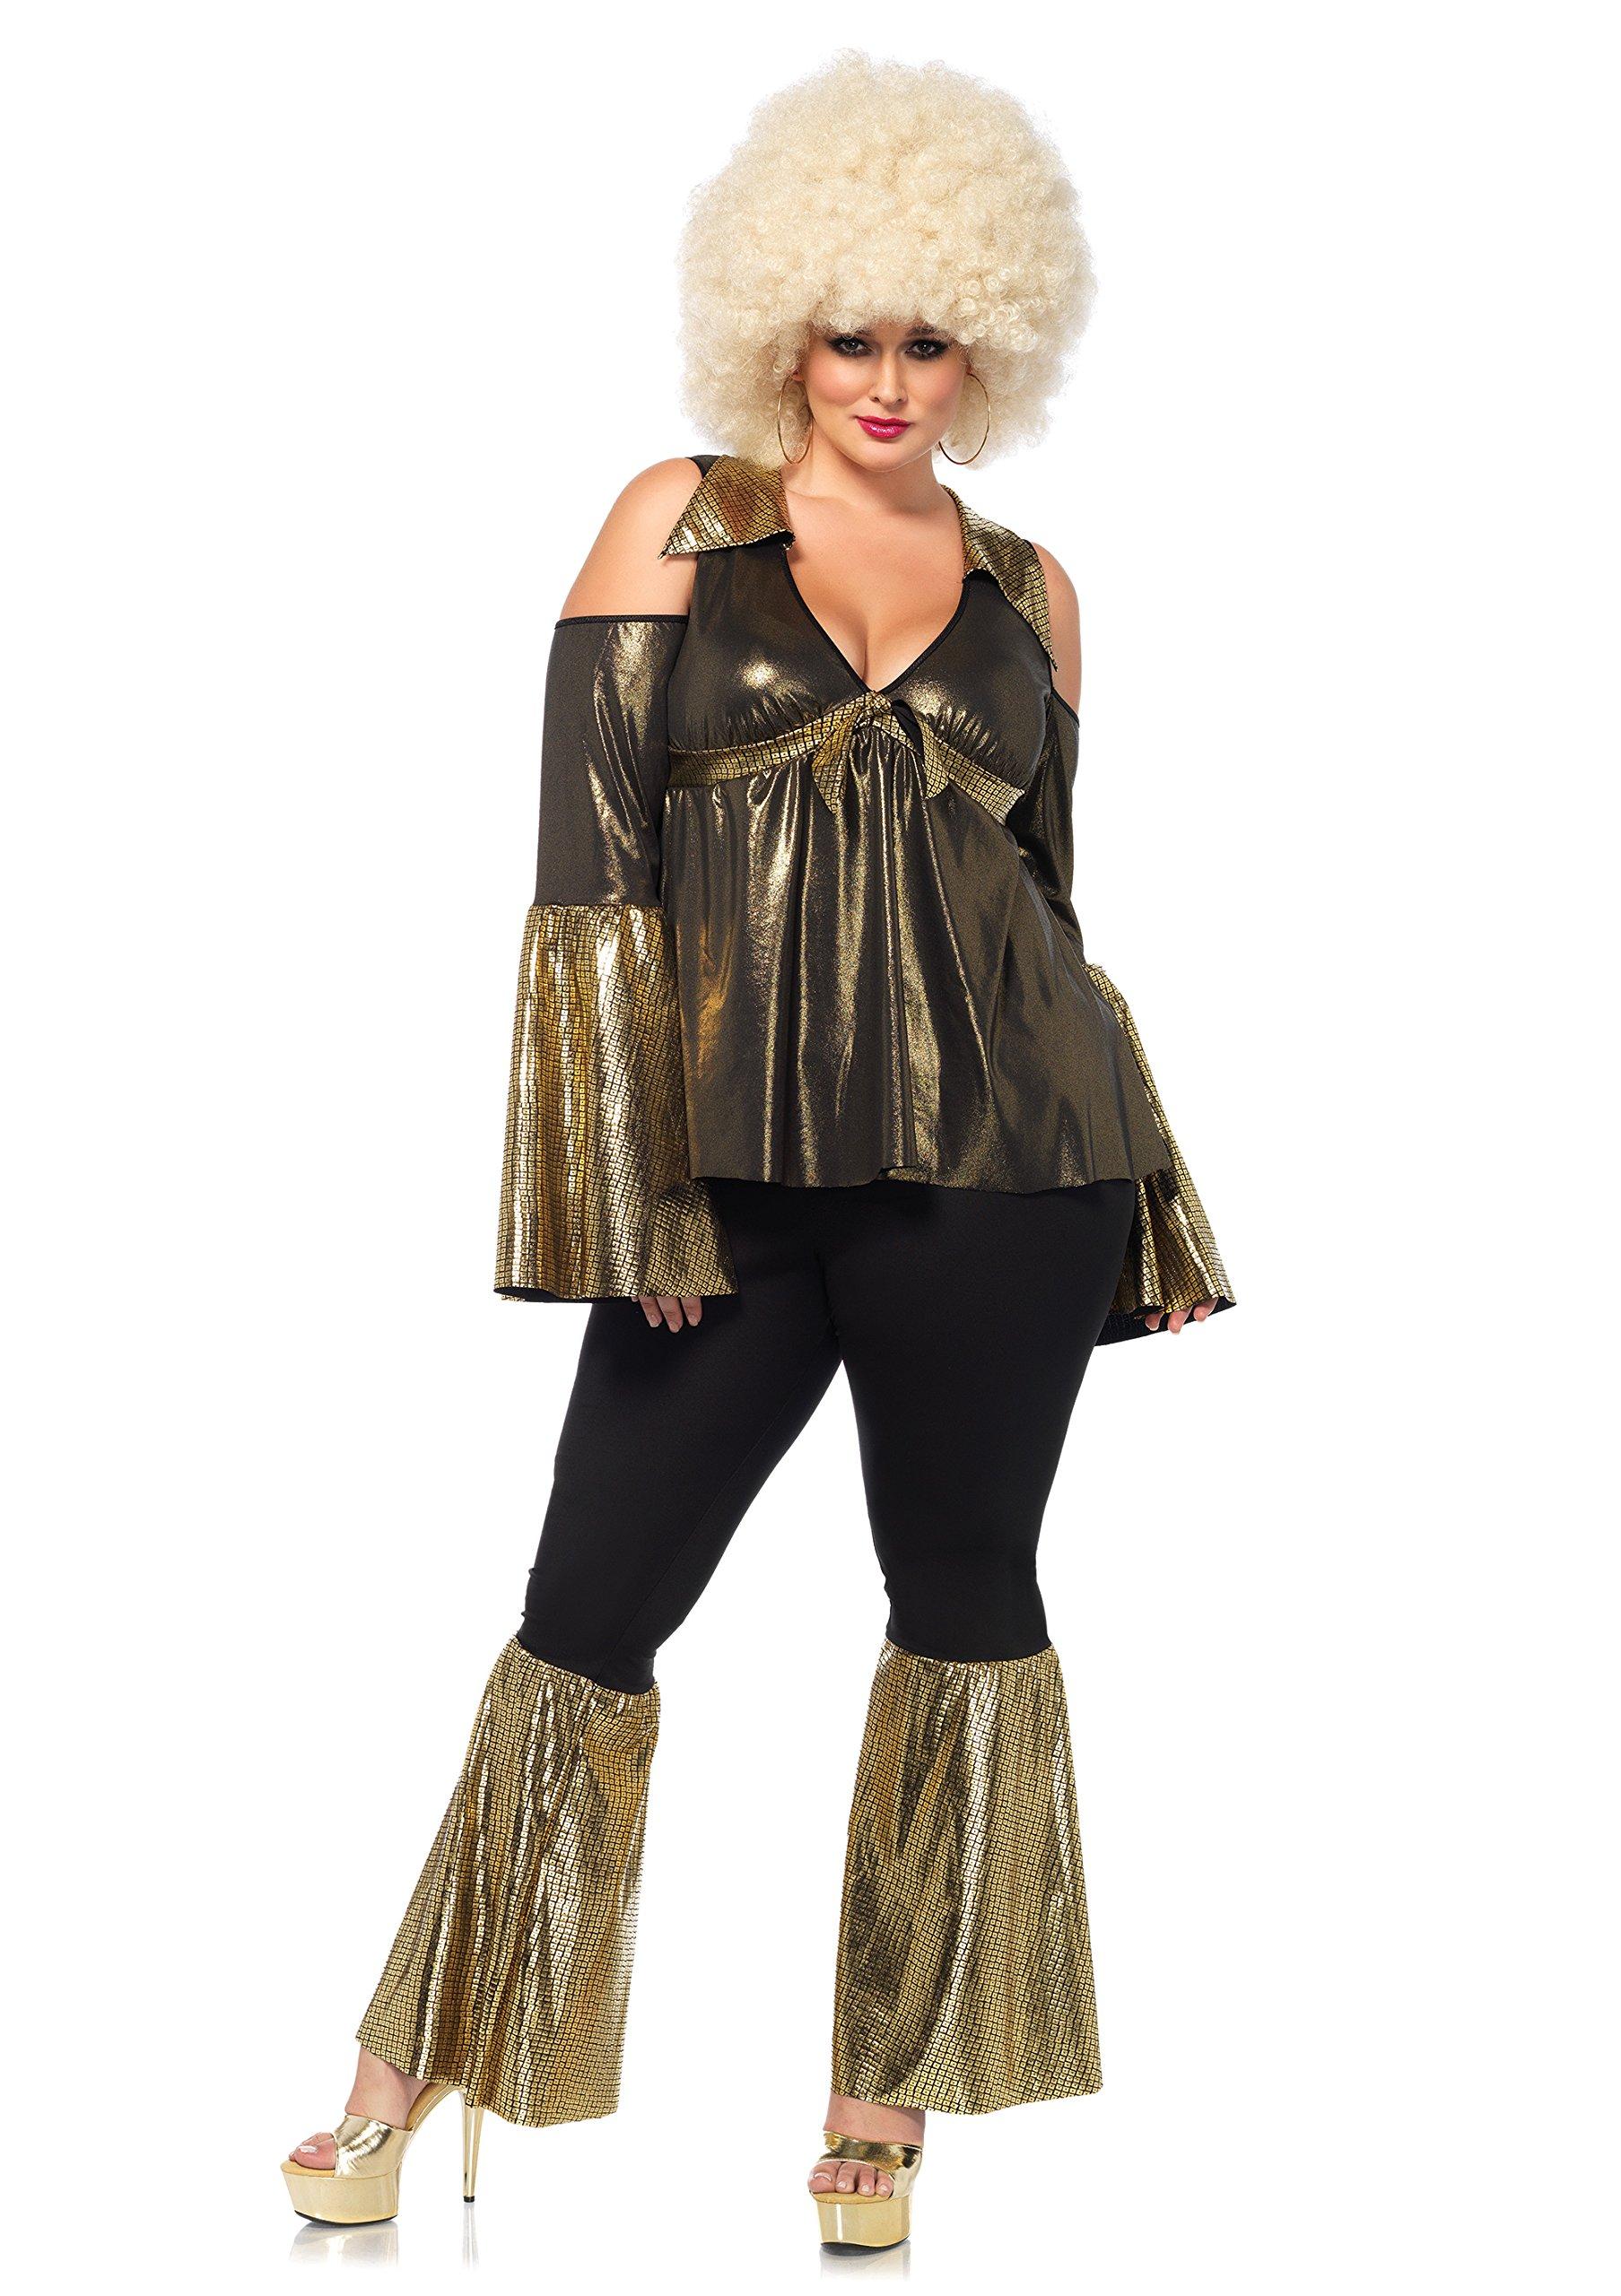 Leg Avenue Women's Plus Size Disco Diva Costume, Black/Gold, 1X-2X